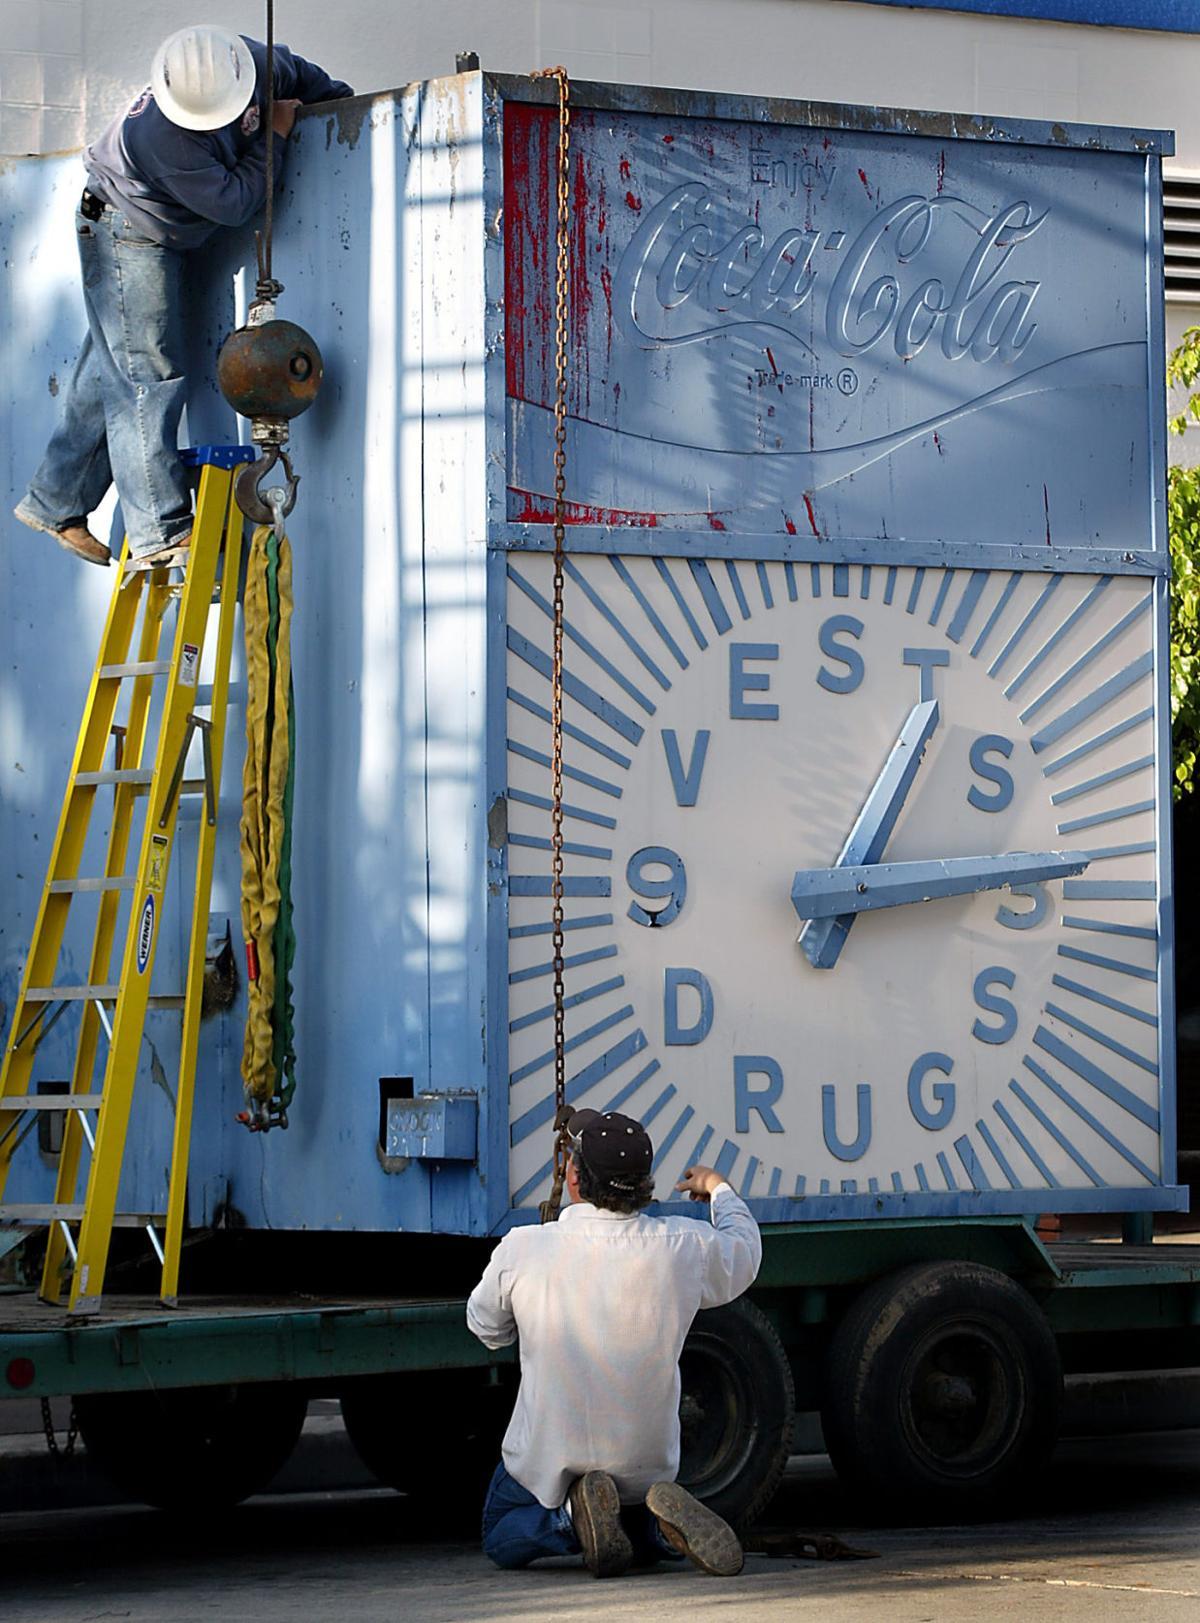 Vests clock